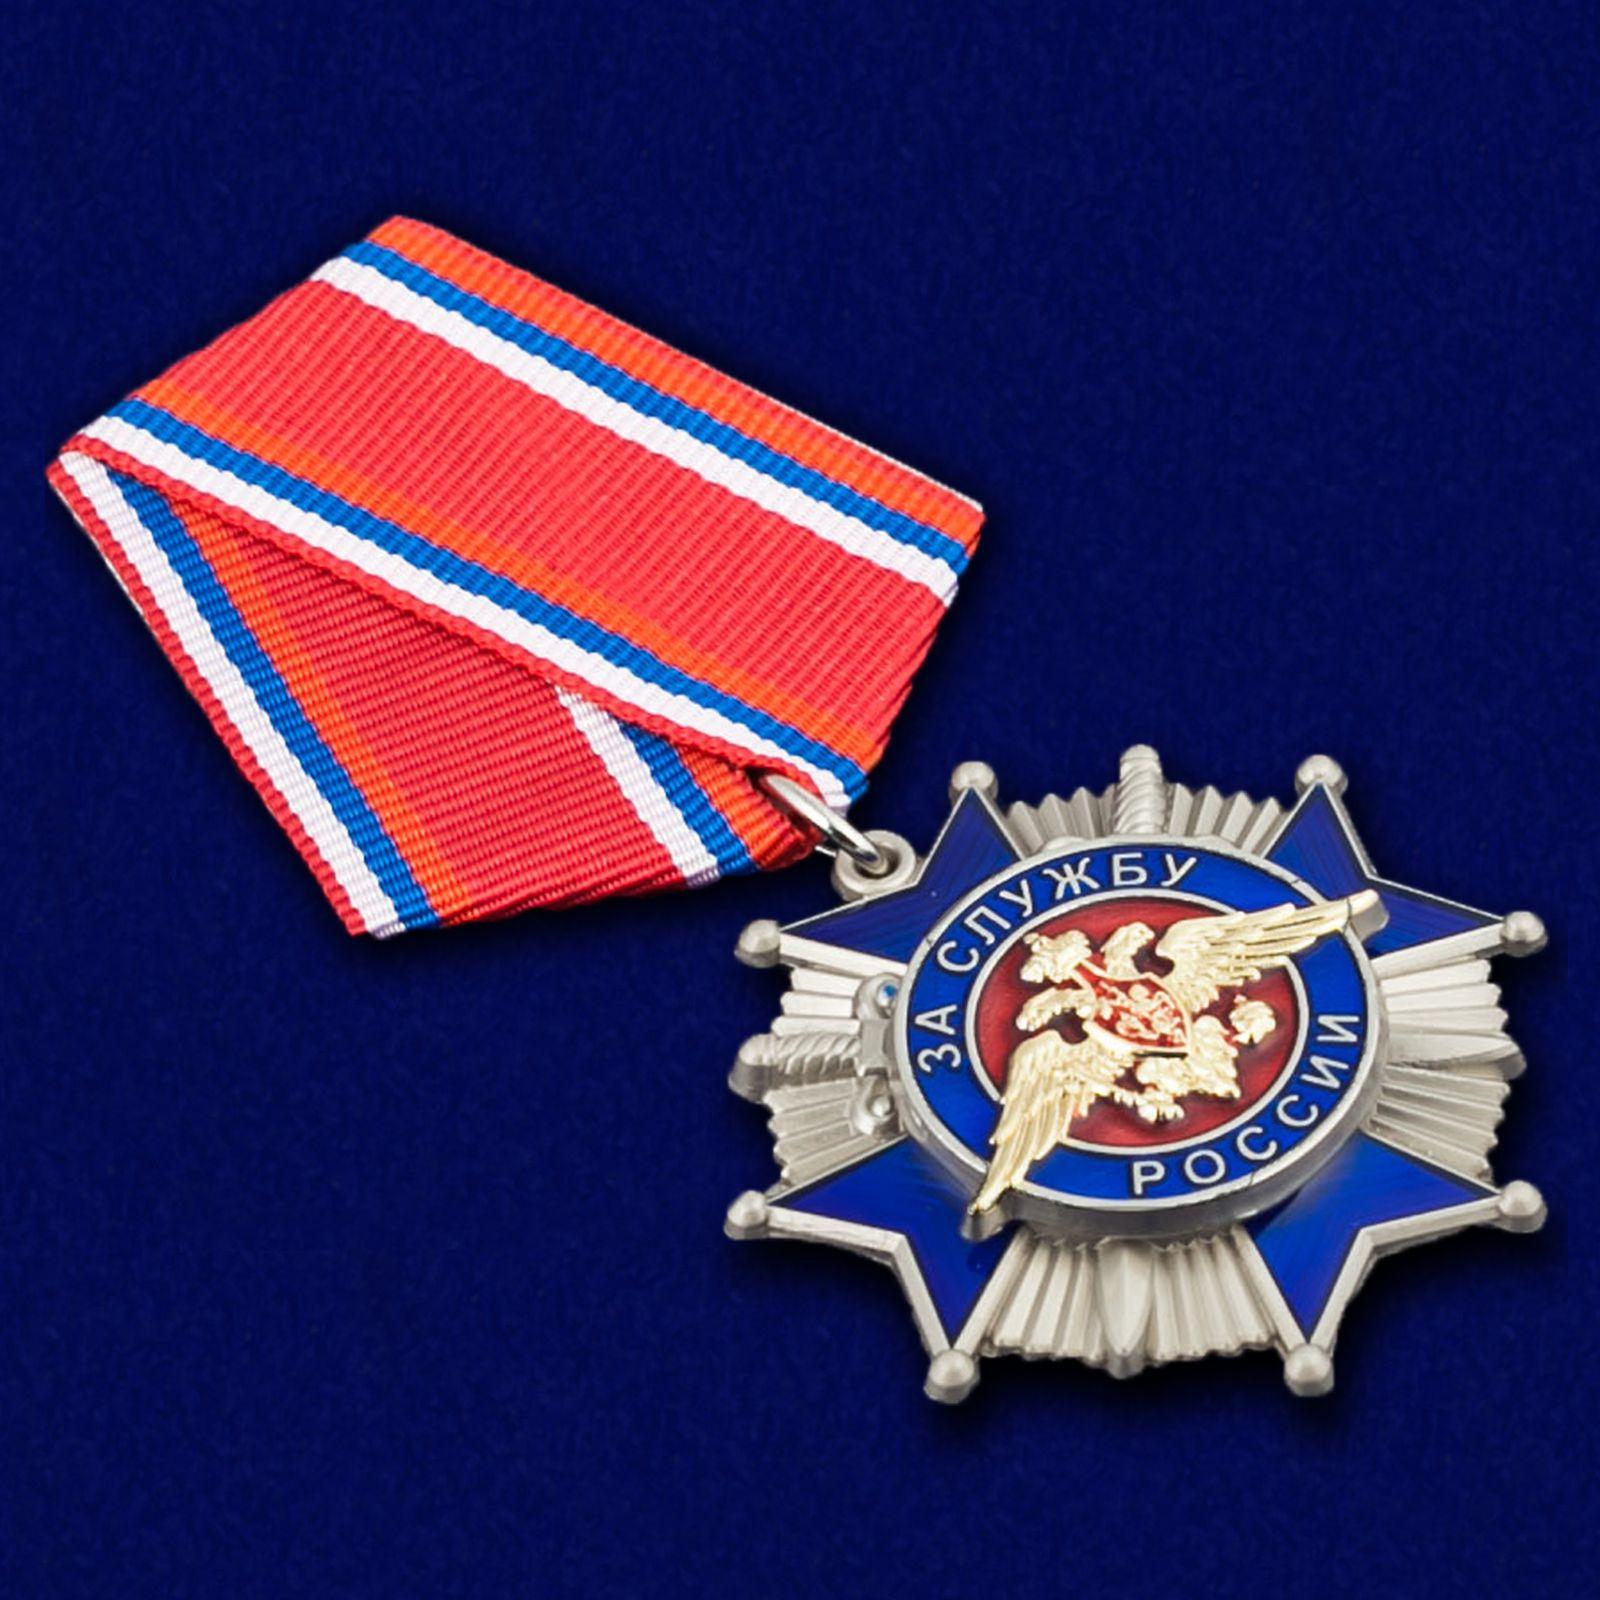 Купить награды МО РФ в Военпро